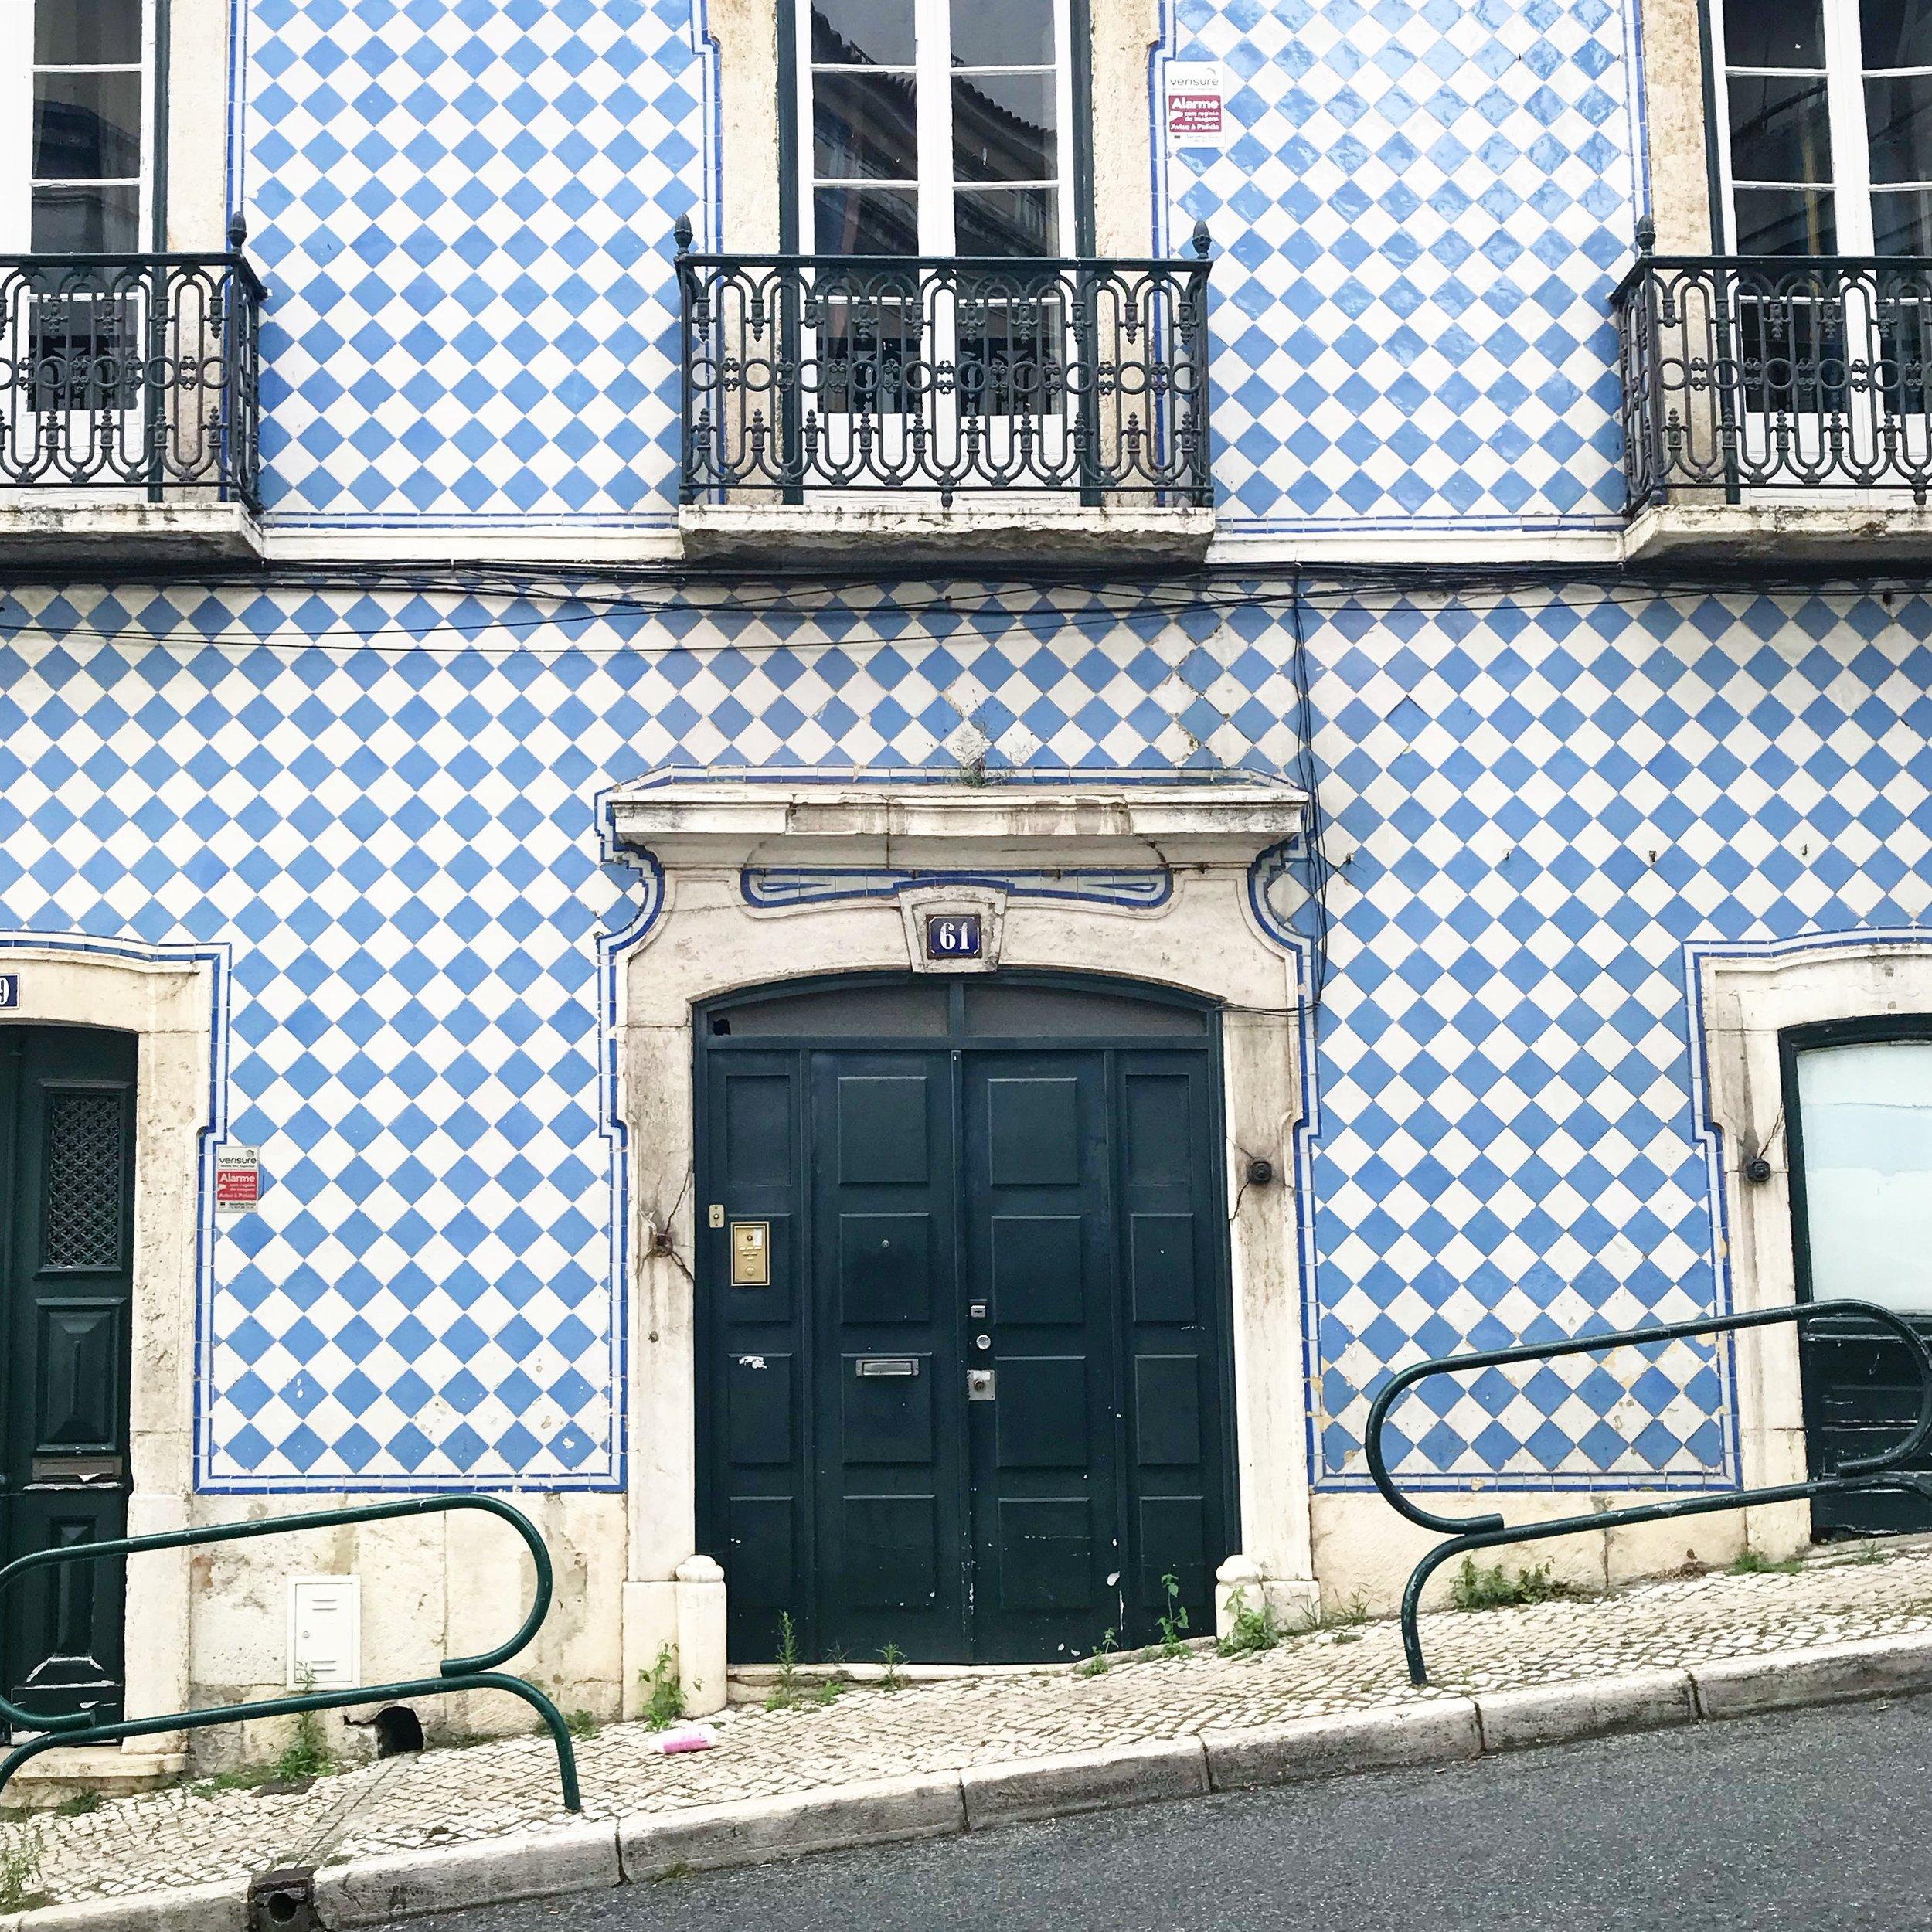 LusitanoStudio_Lisbon7.JPG